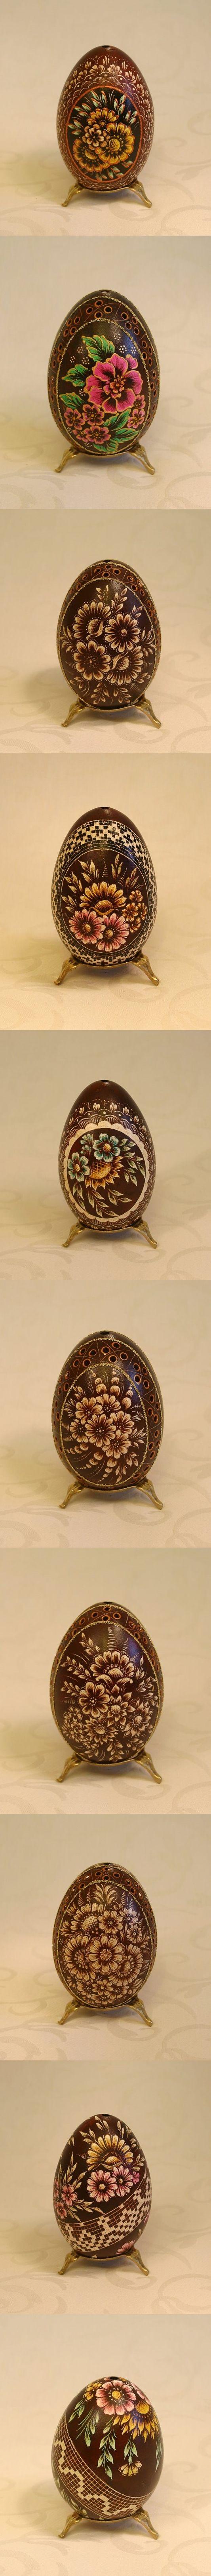 Polish Easter Eggs - kraszanki/pisanki (stratched eggs)